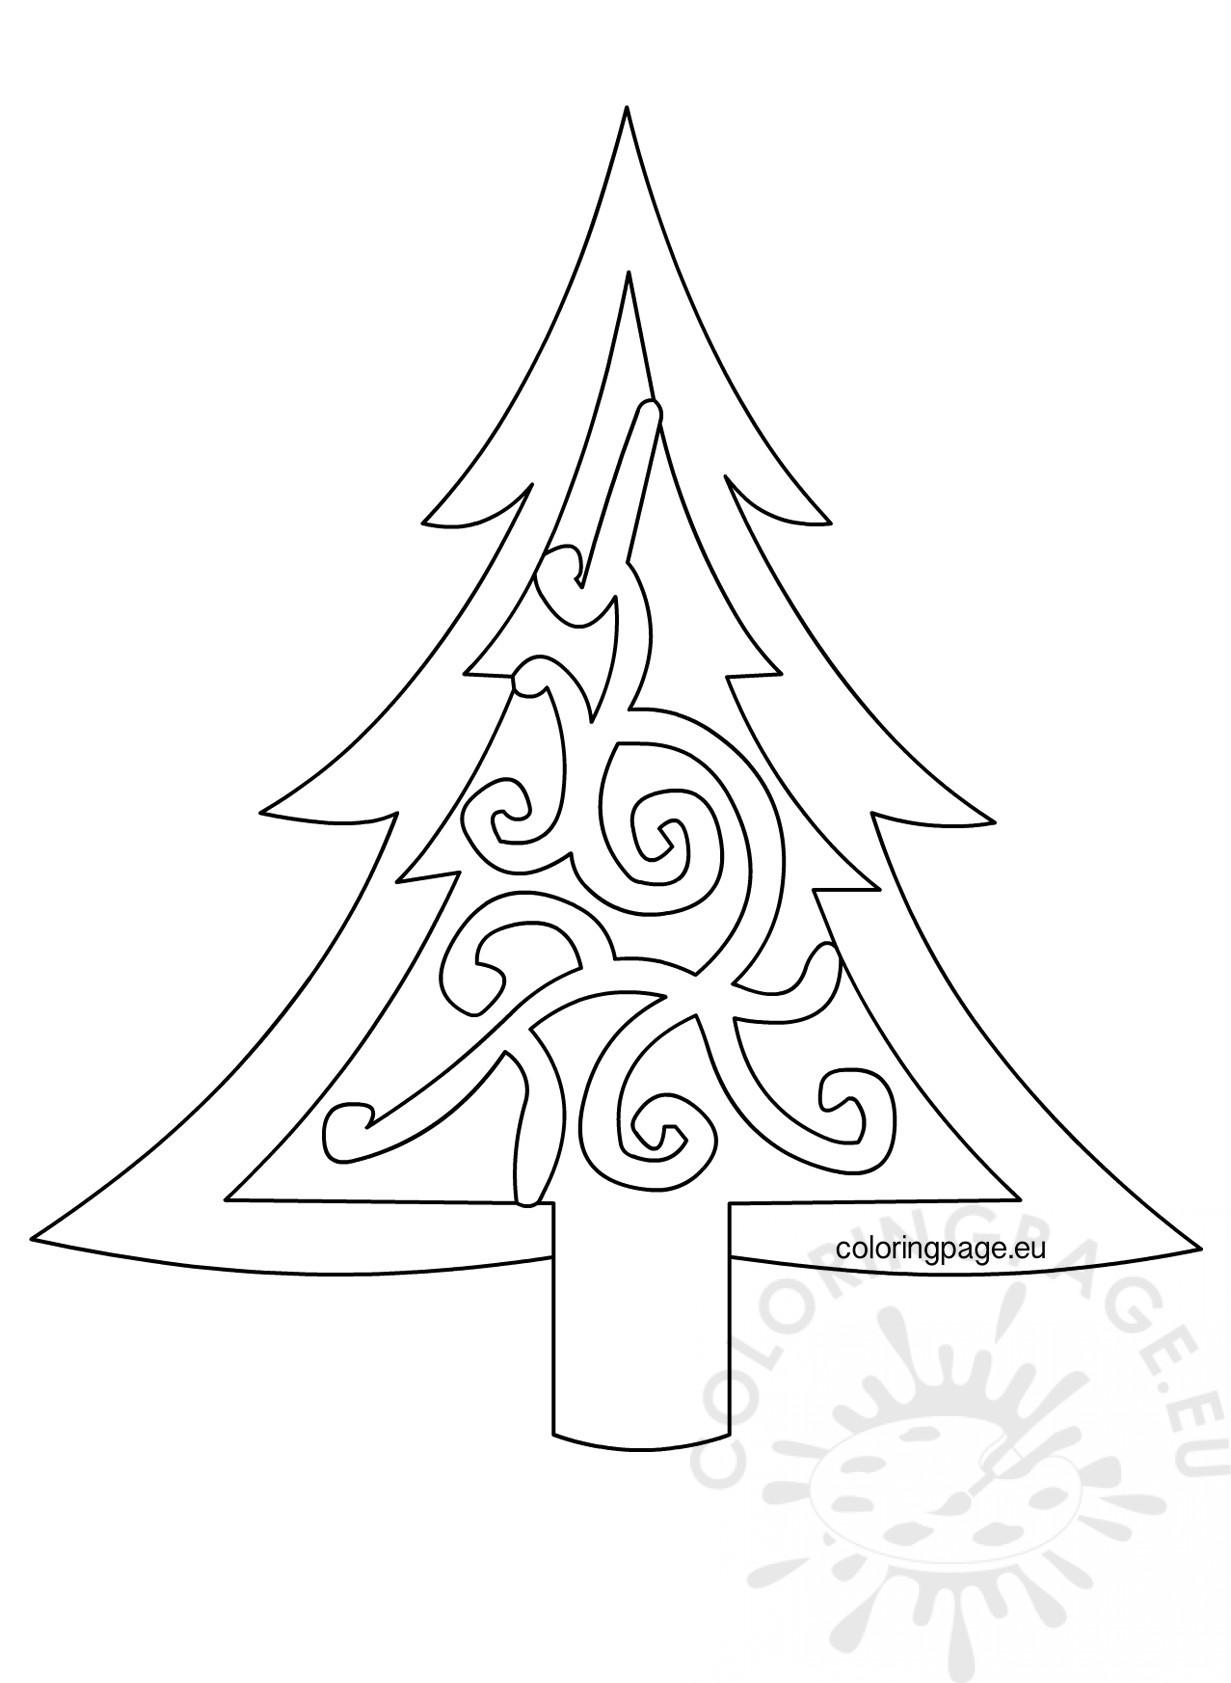 Xmas tree template printable - Coloring Page